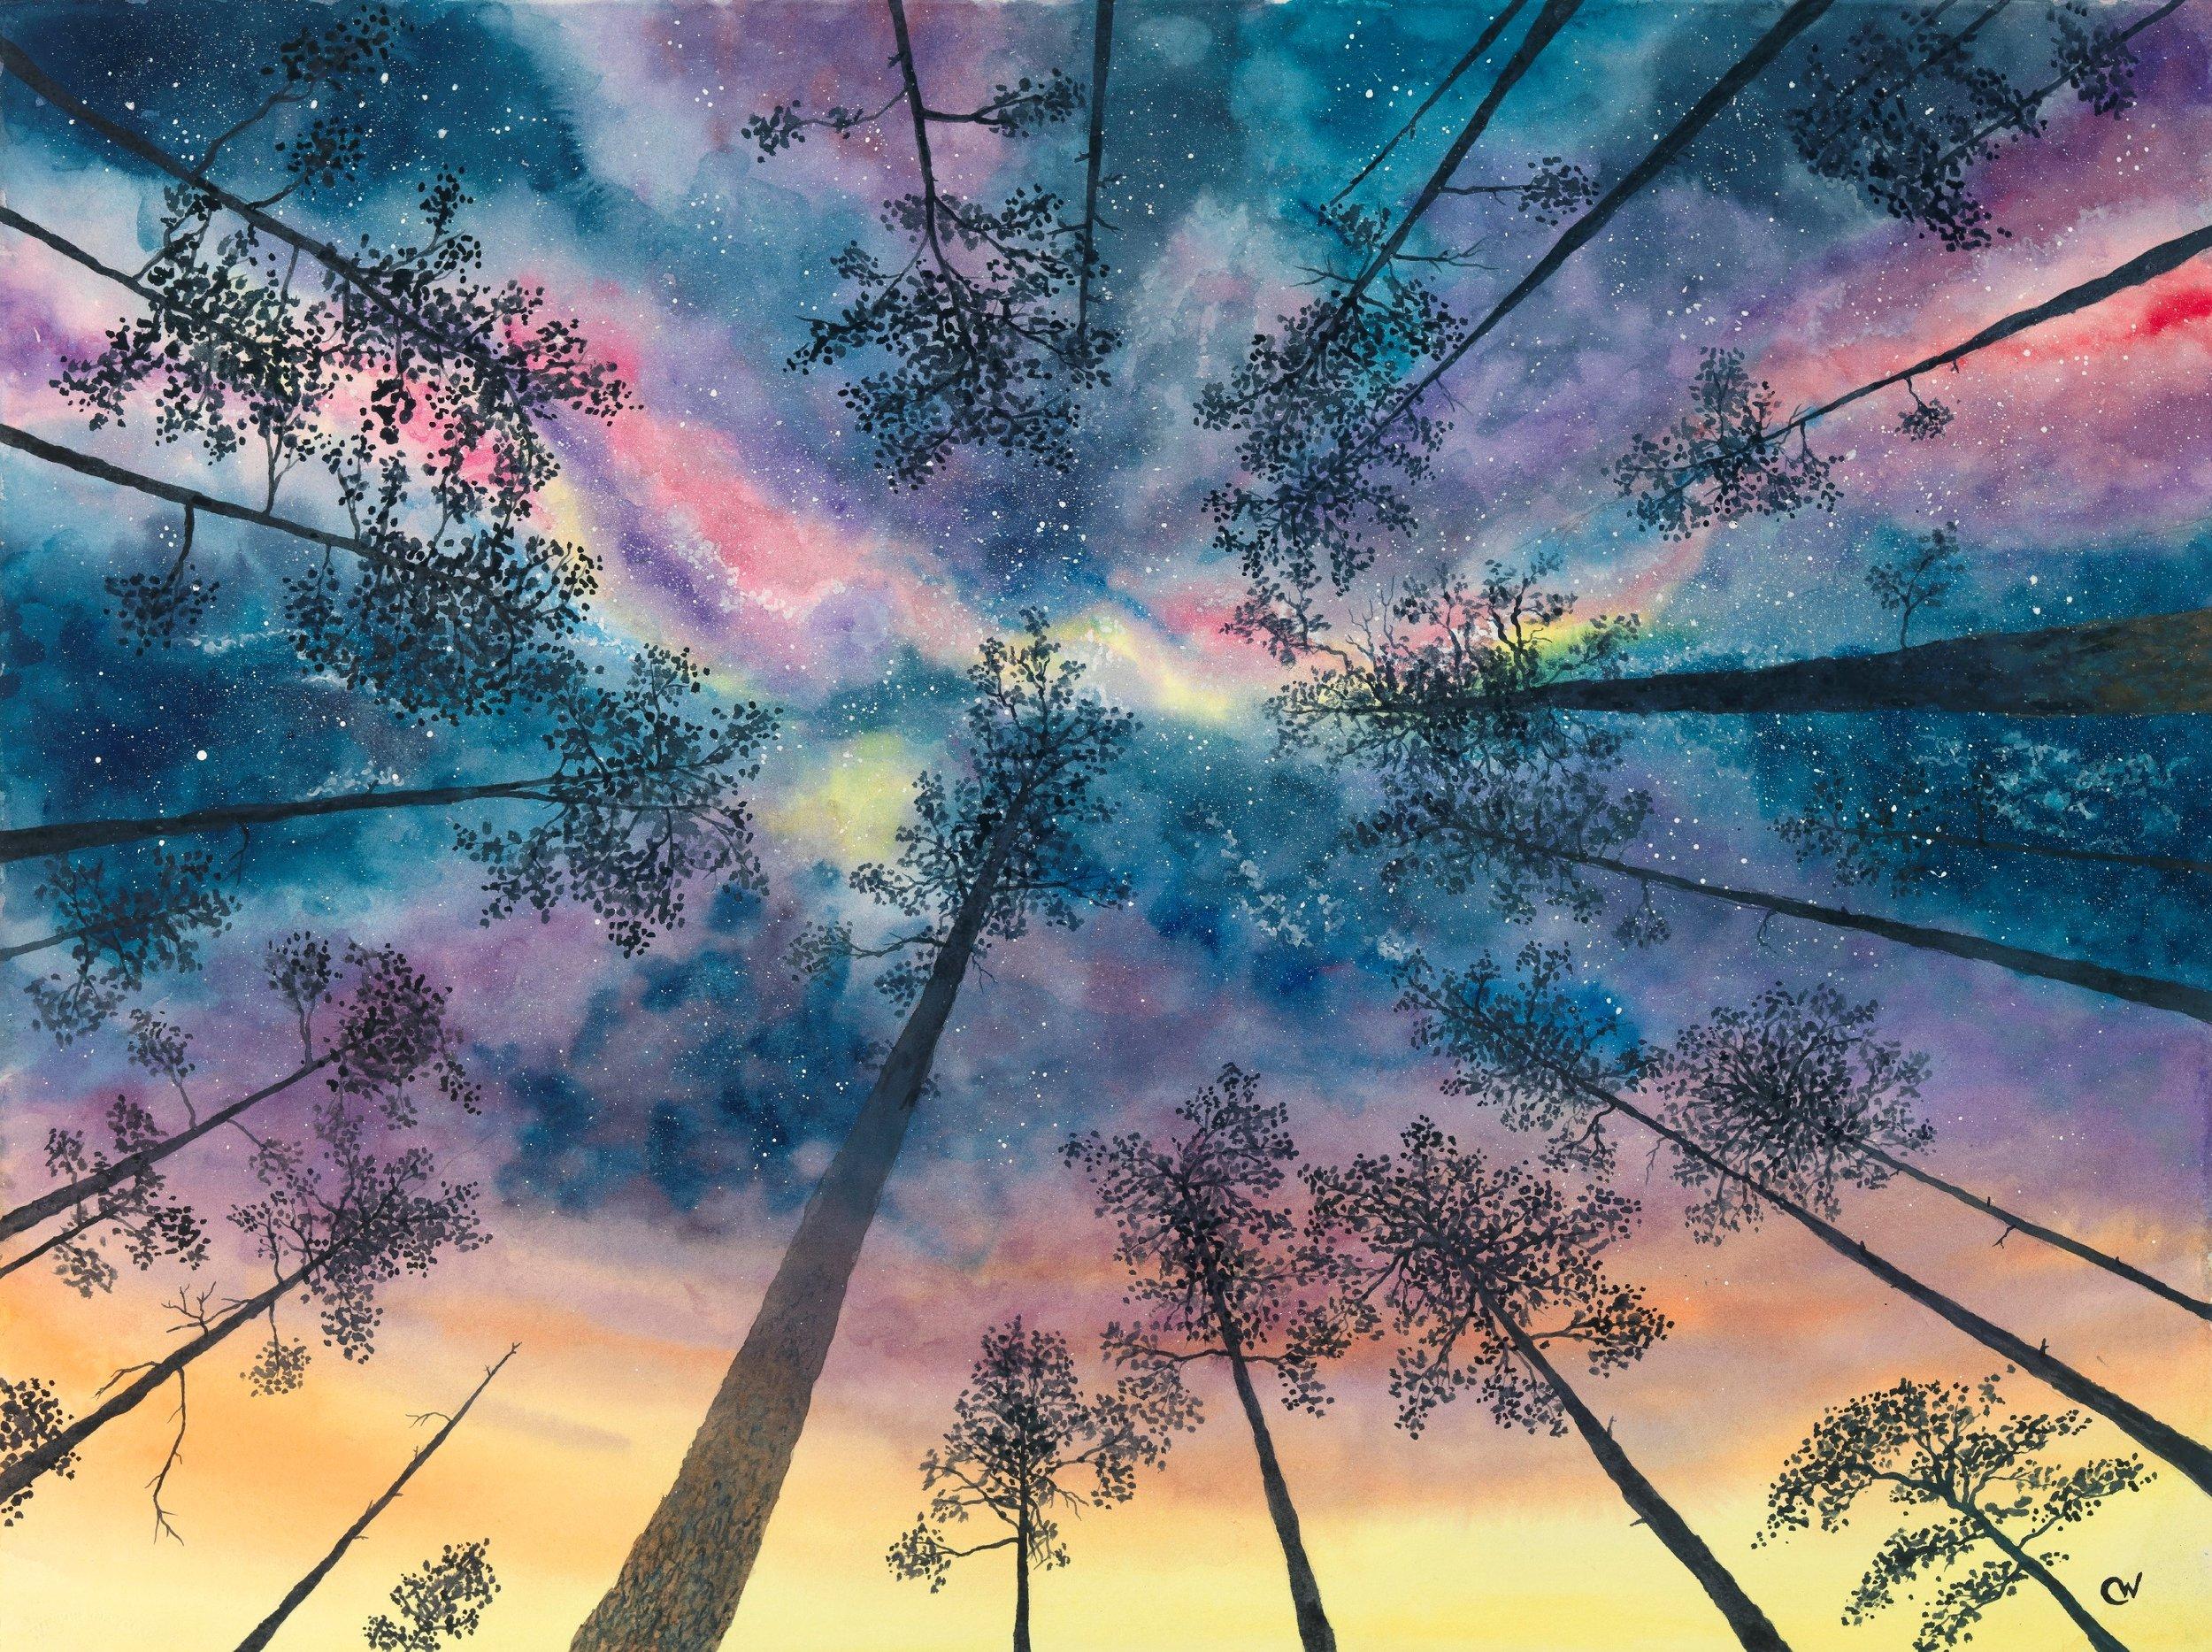 Night Sky in the Pines (75MB).jpg